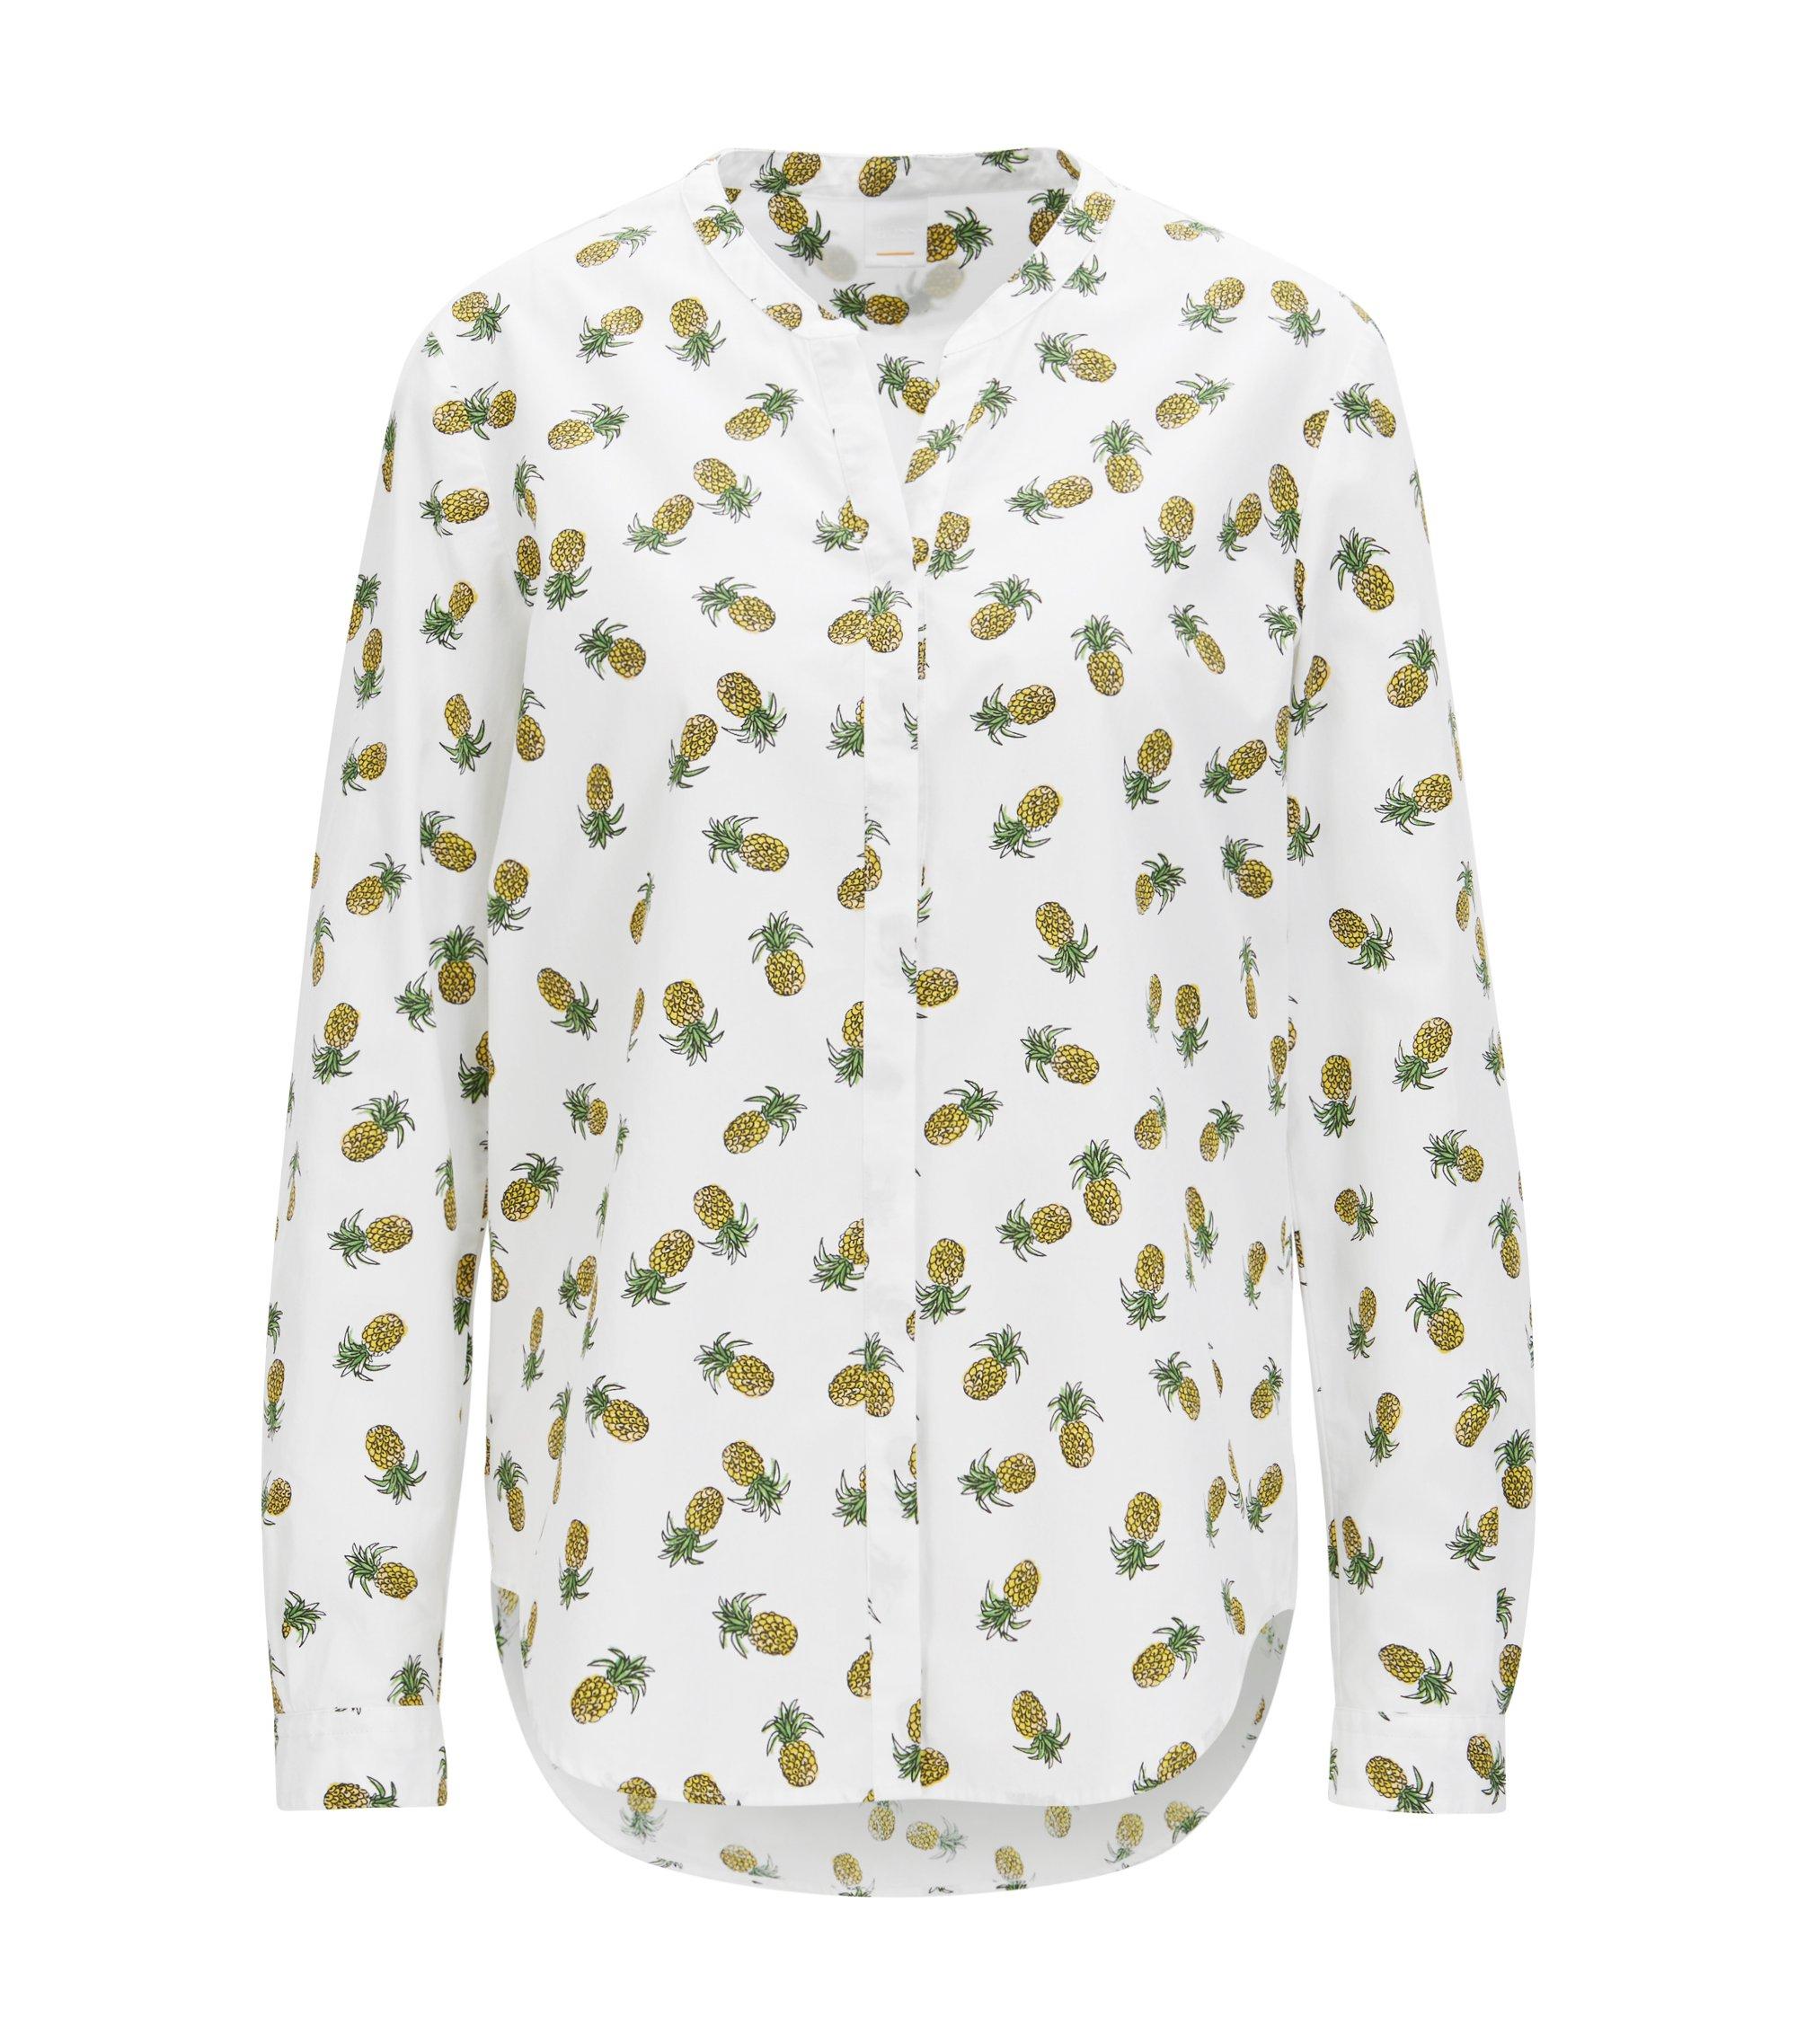 Relaxed-Fit Bluse aus Baumwoll-Canvas mit Ananas-Print, Weiß